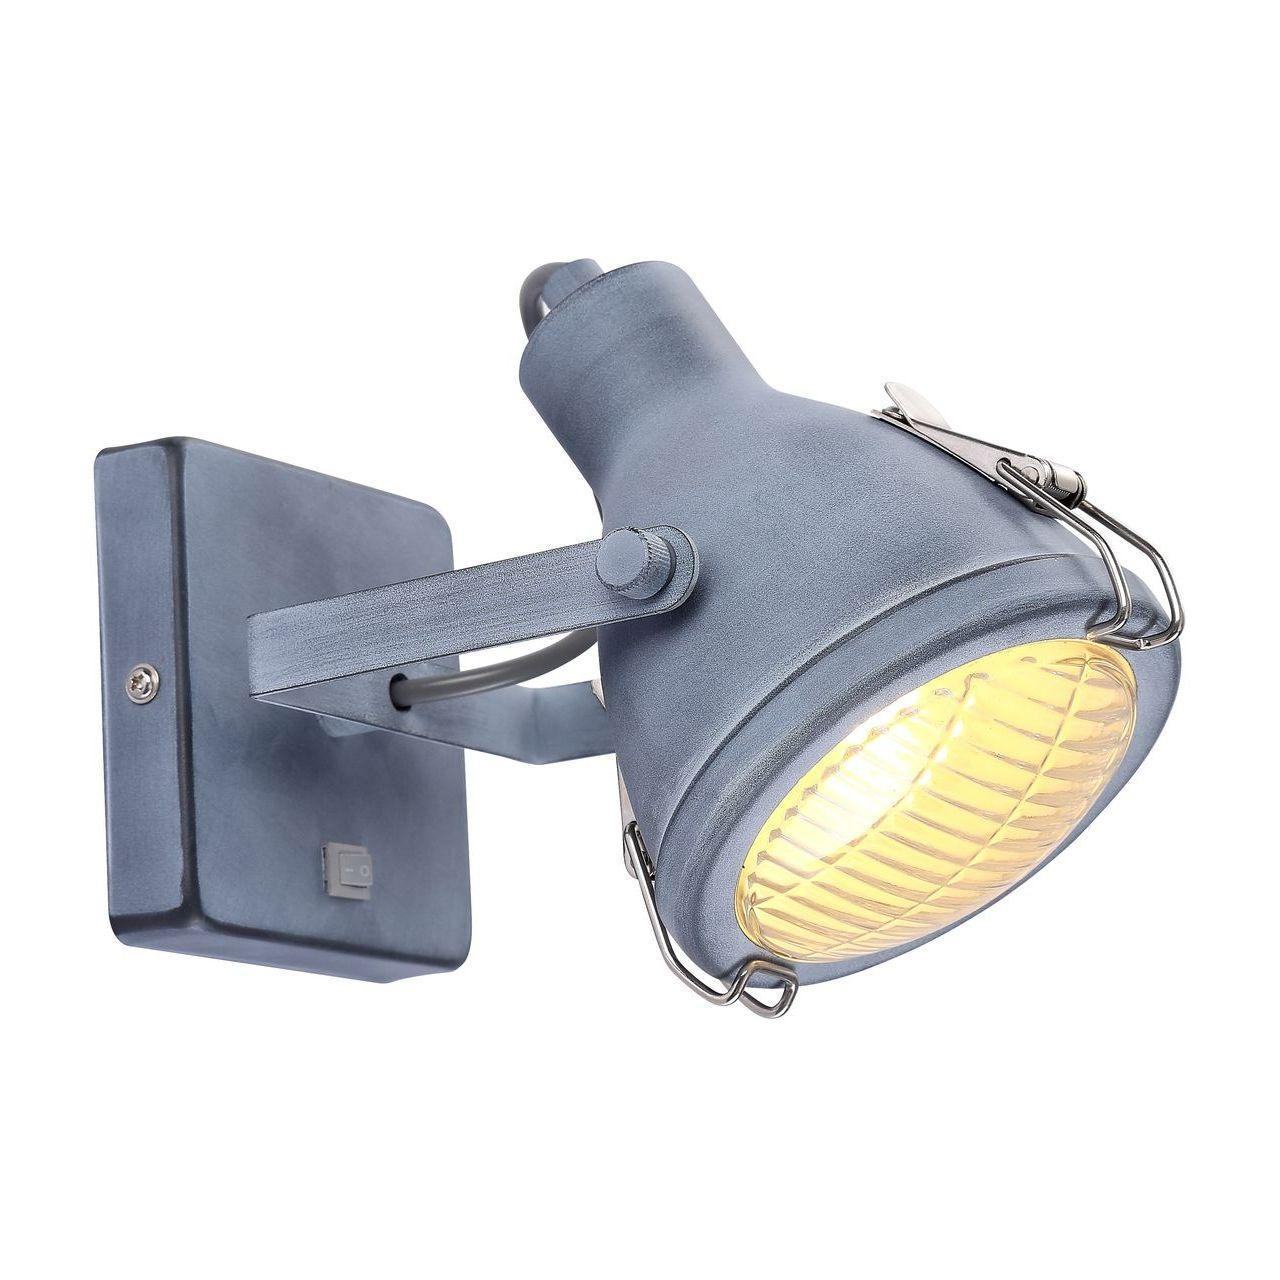 цена Спот Arte Lamp A9178AP-1GY в интернет-магазинах